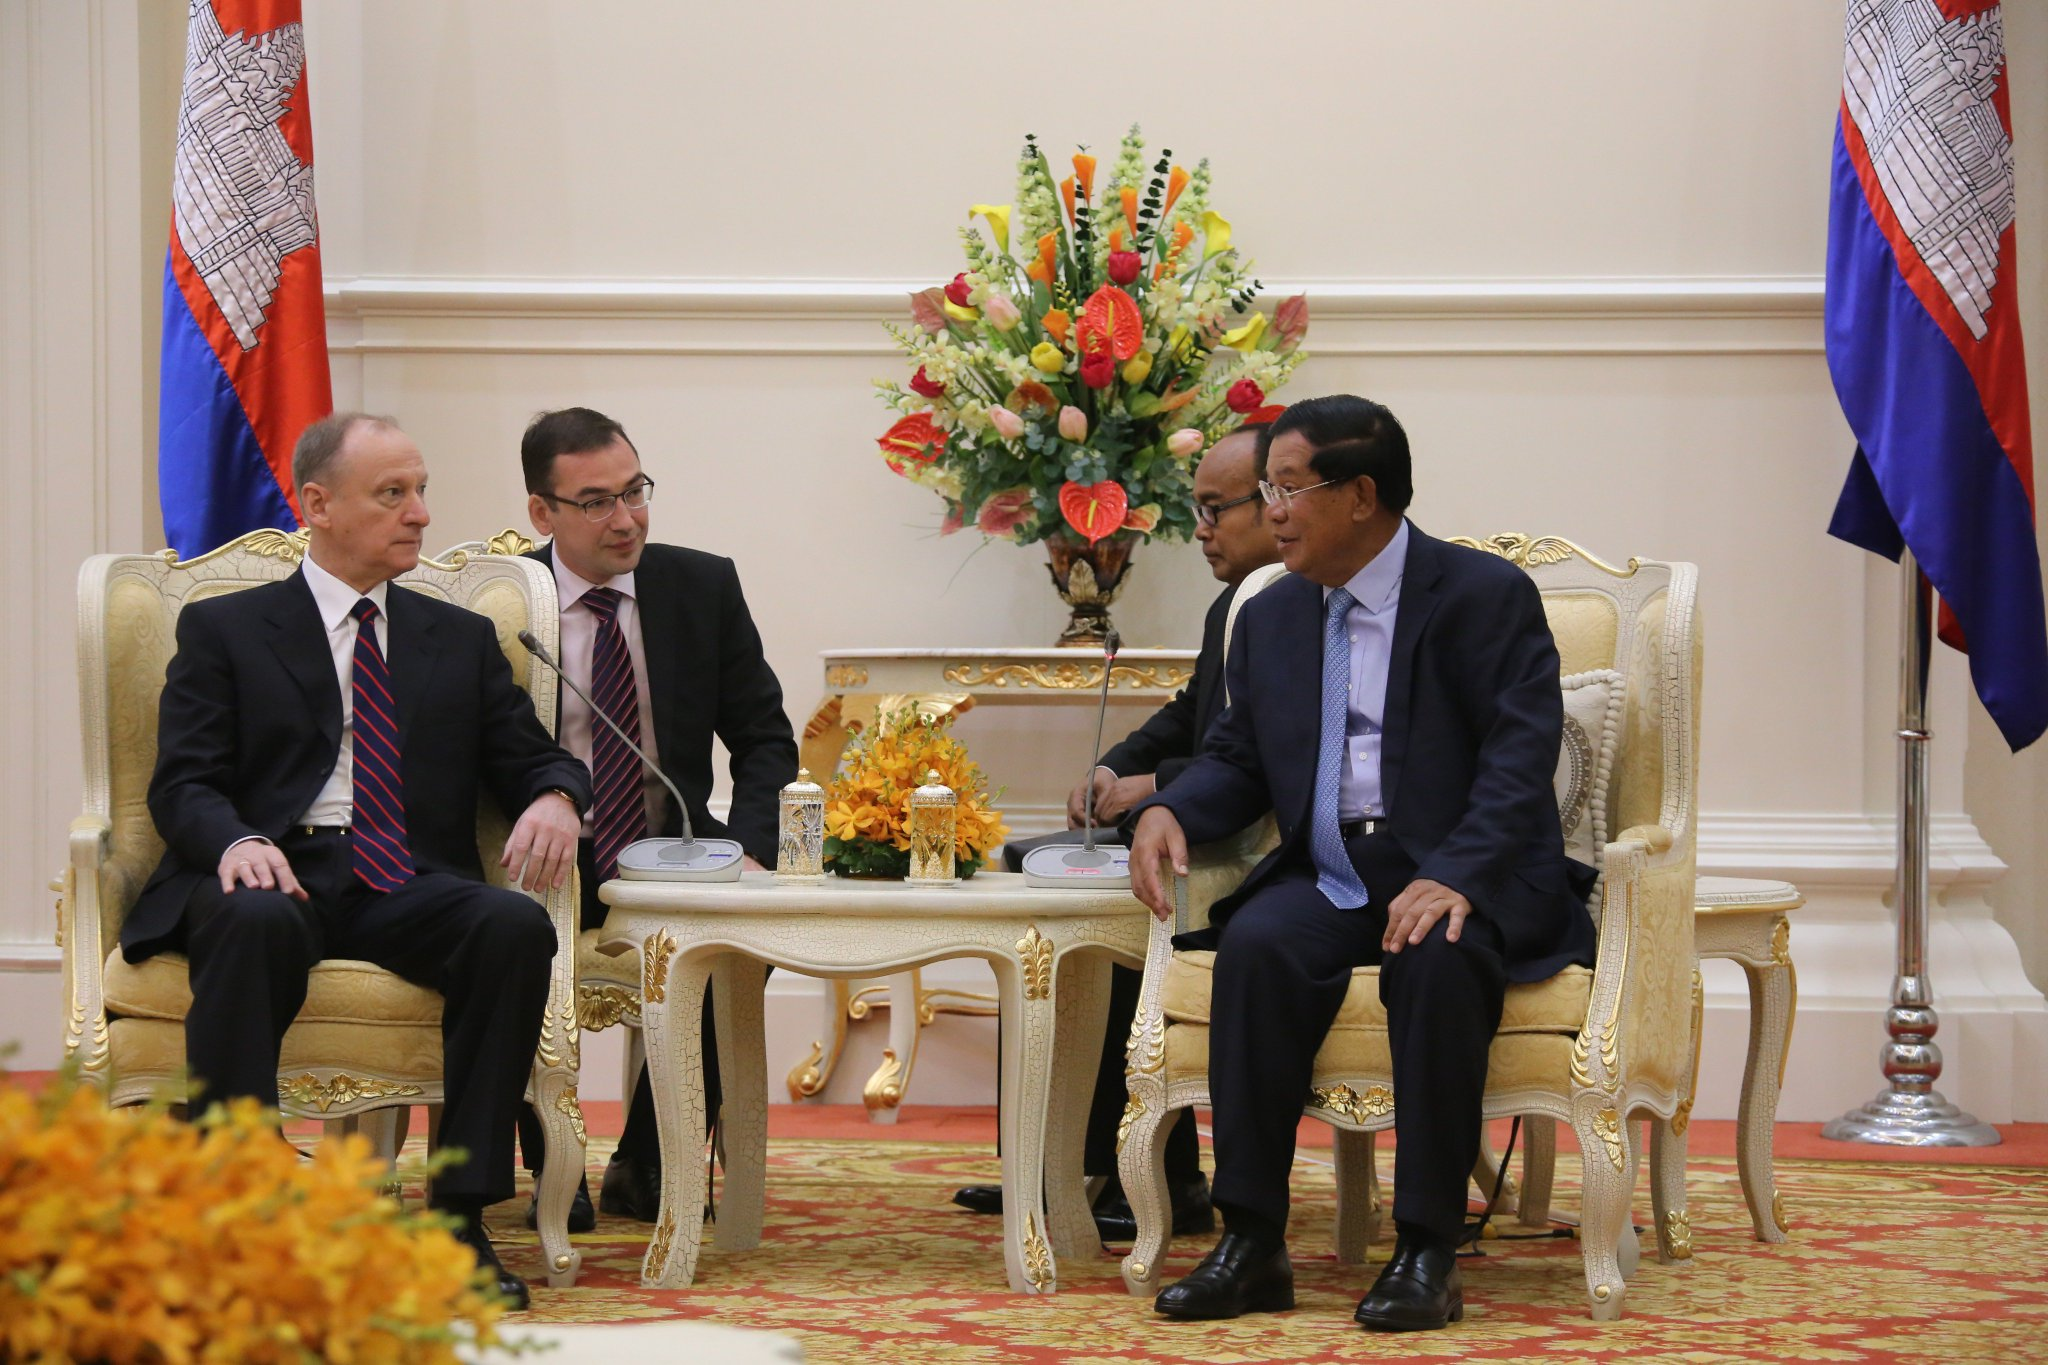 Thumbnail for Визит Секретаря Совета Безопасности Российской Федерации Н.П.Патрушева в Королевство Камбоджа